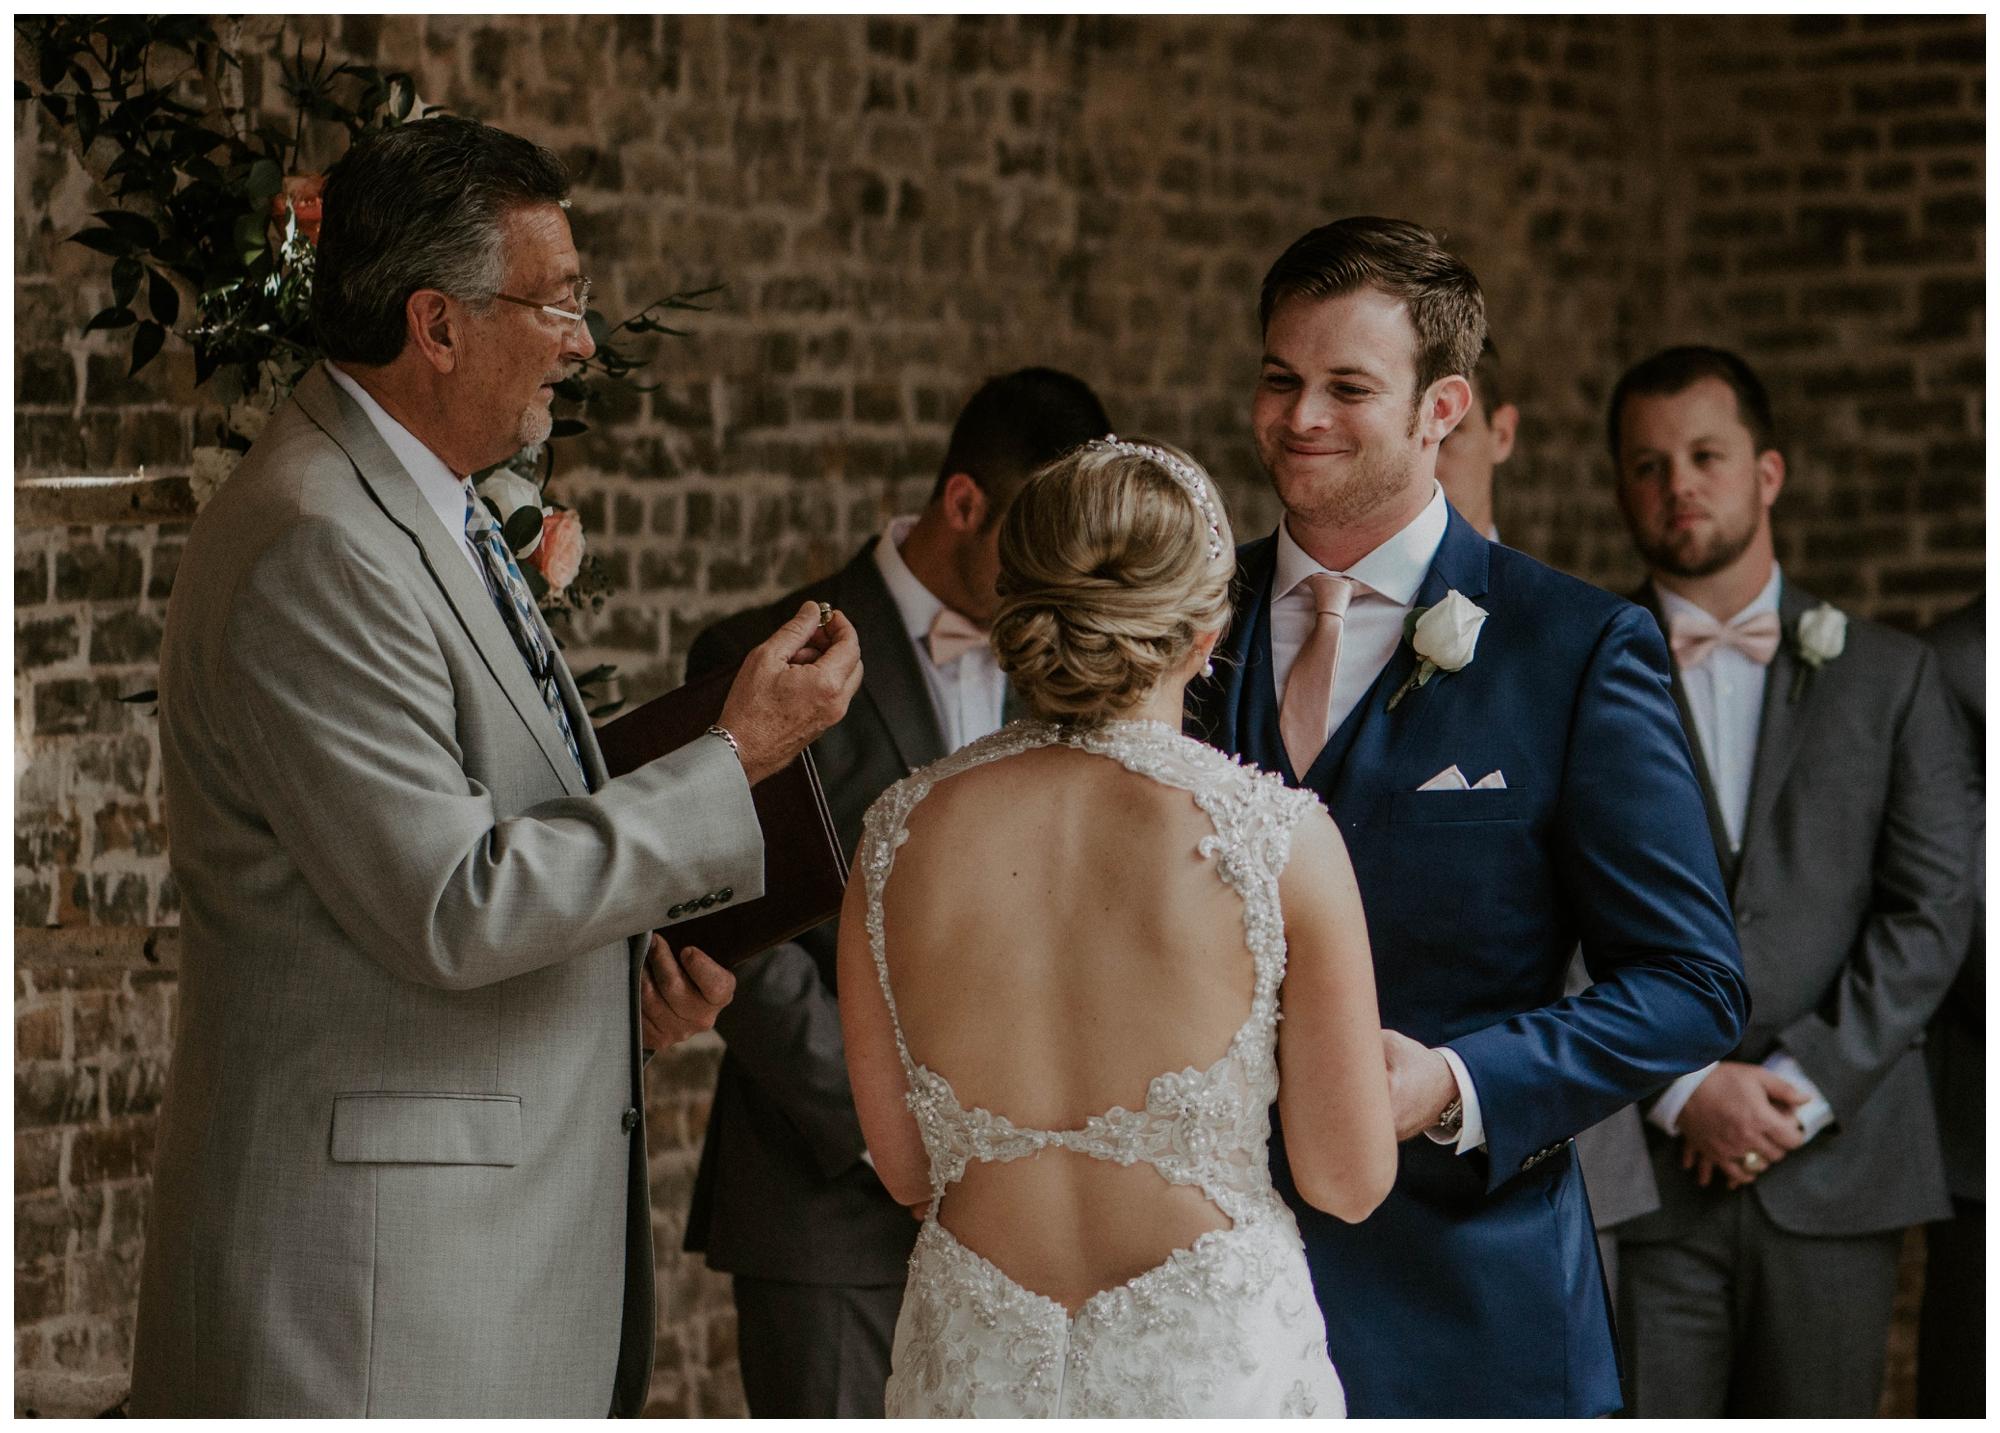 austin-texas-wedding-photography-1778-photographie_0063.jpg